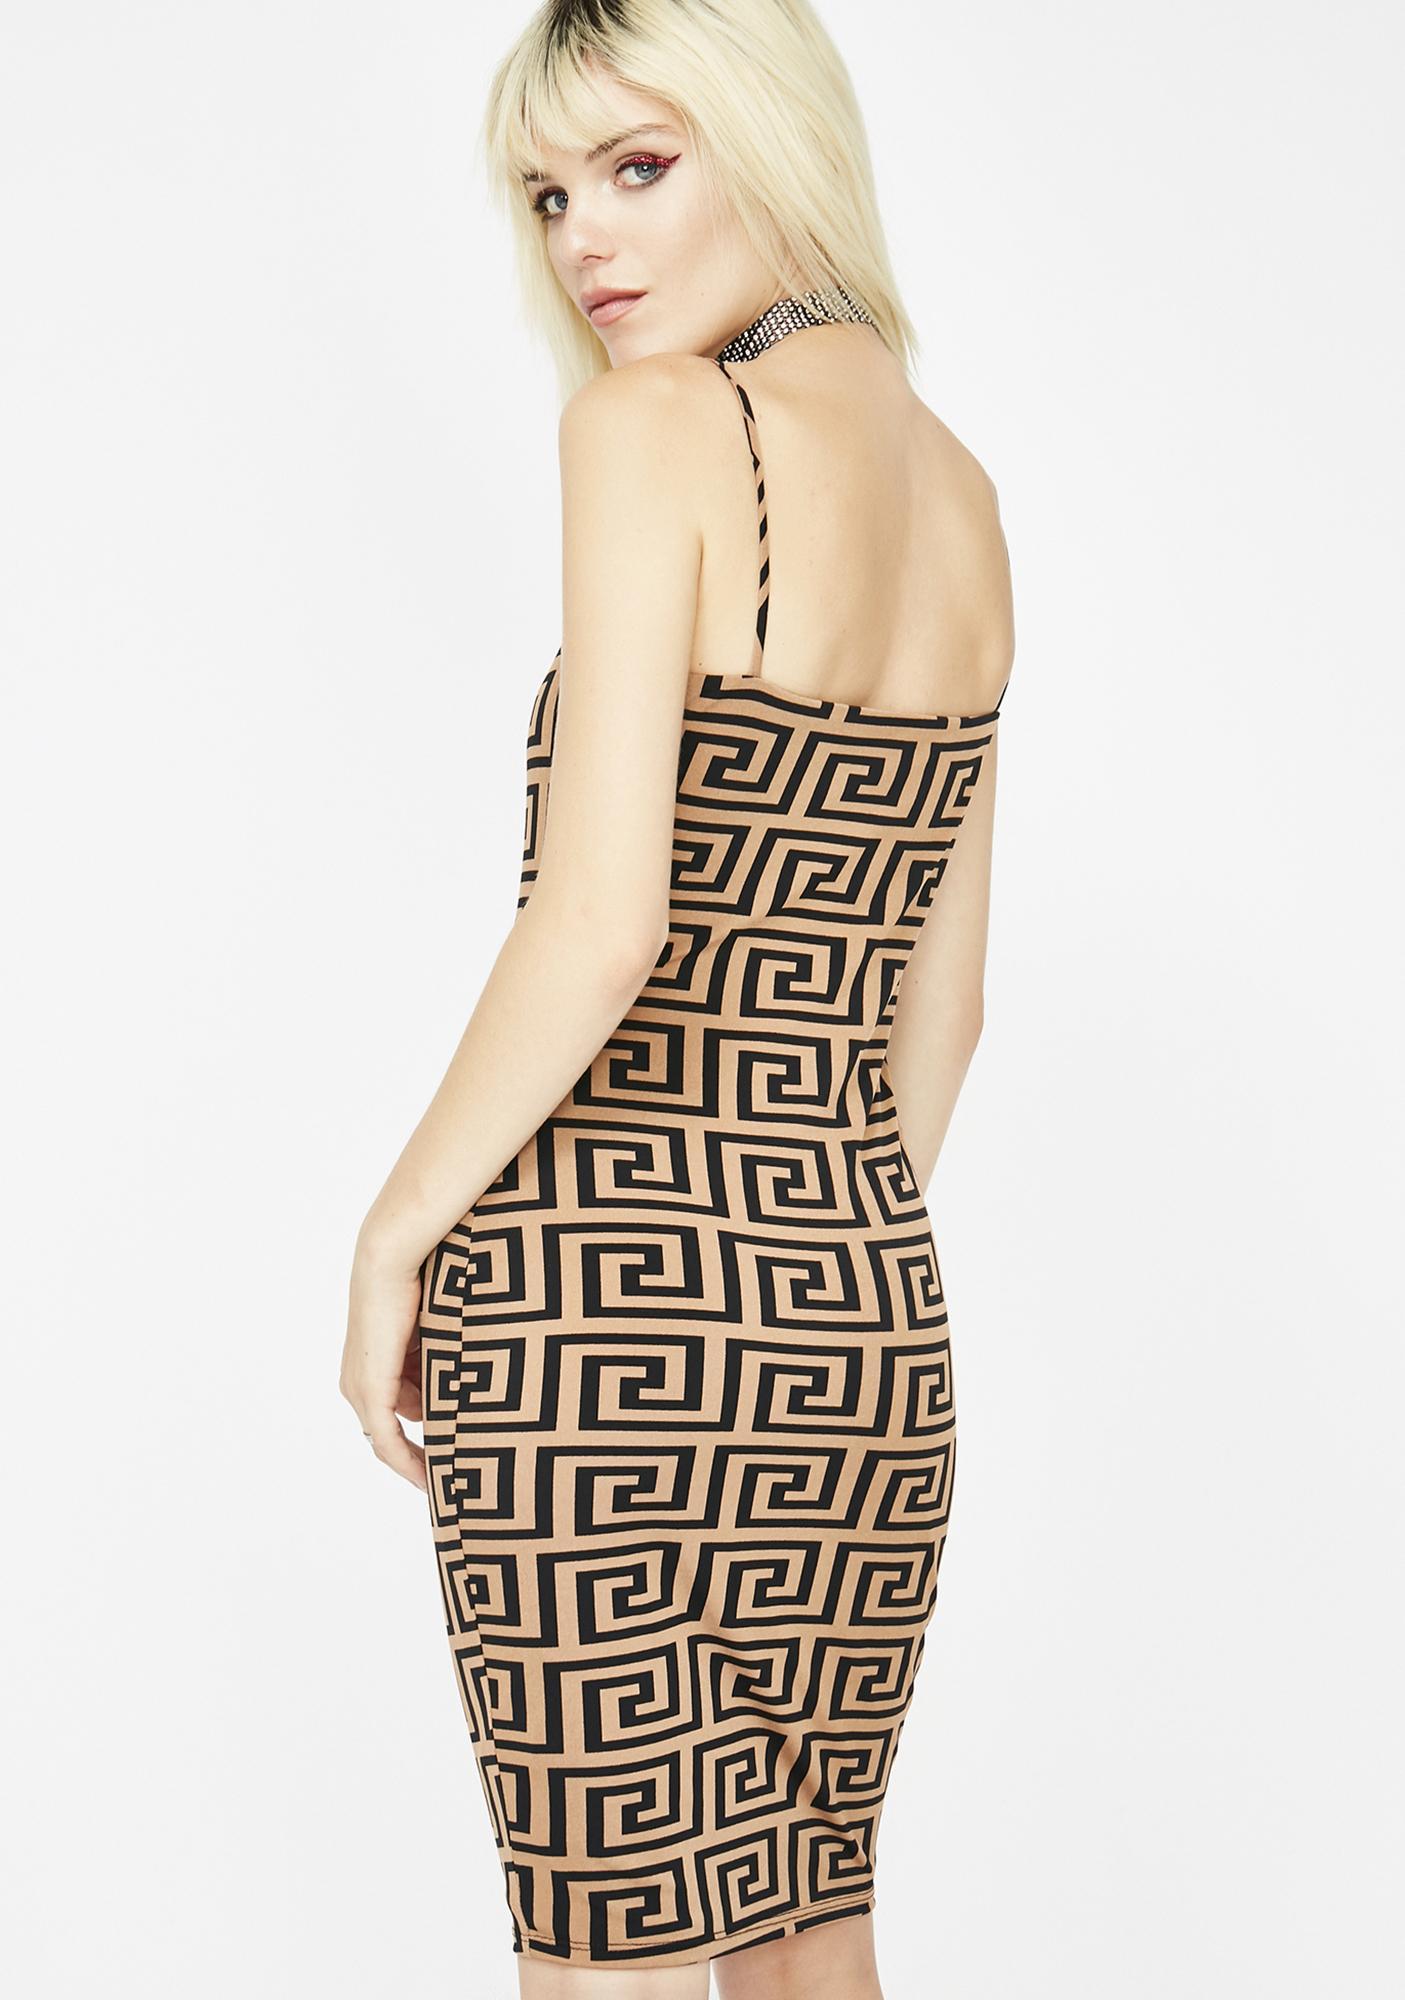 Fauxsace Bodycon Dress